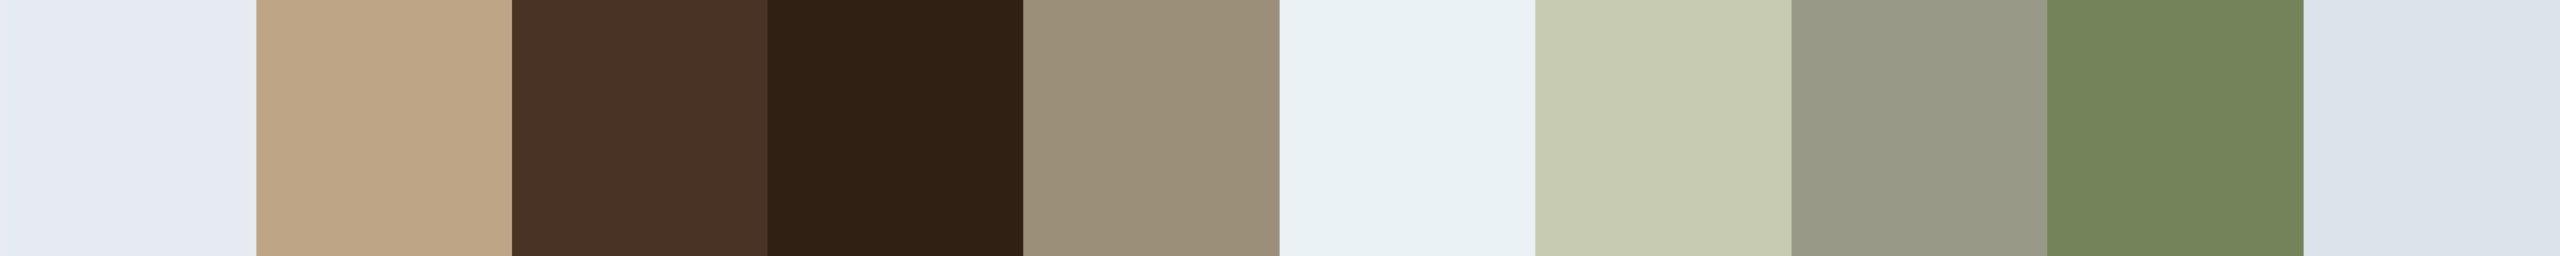 618 Prapelia Color Palette